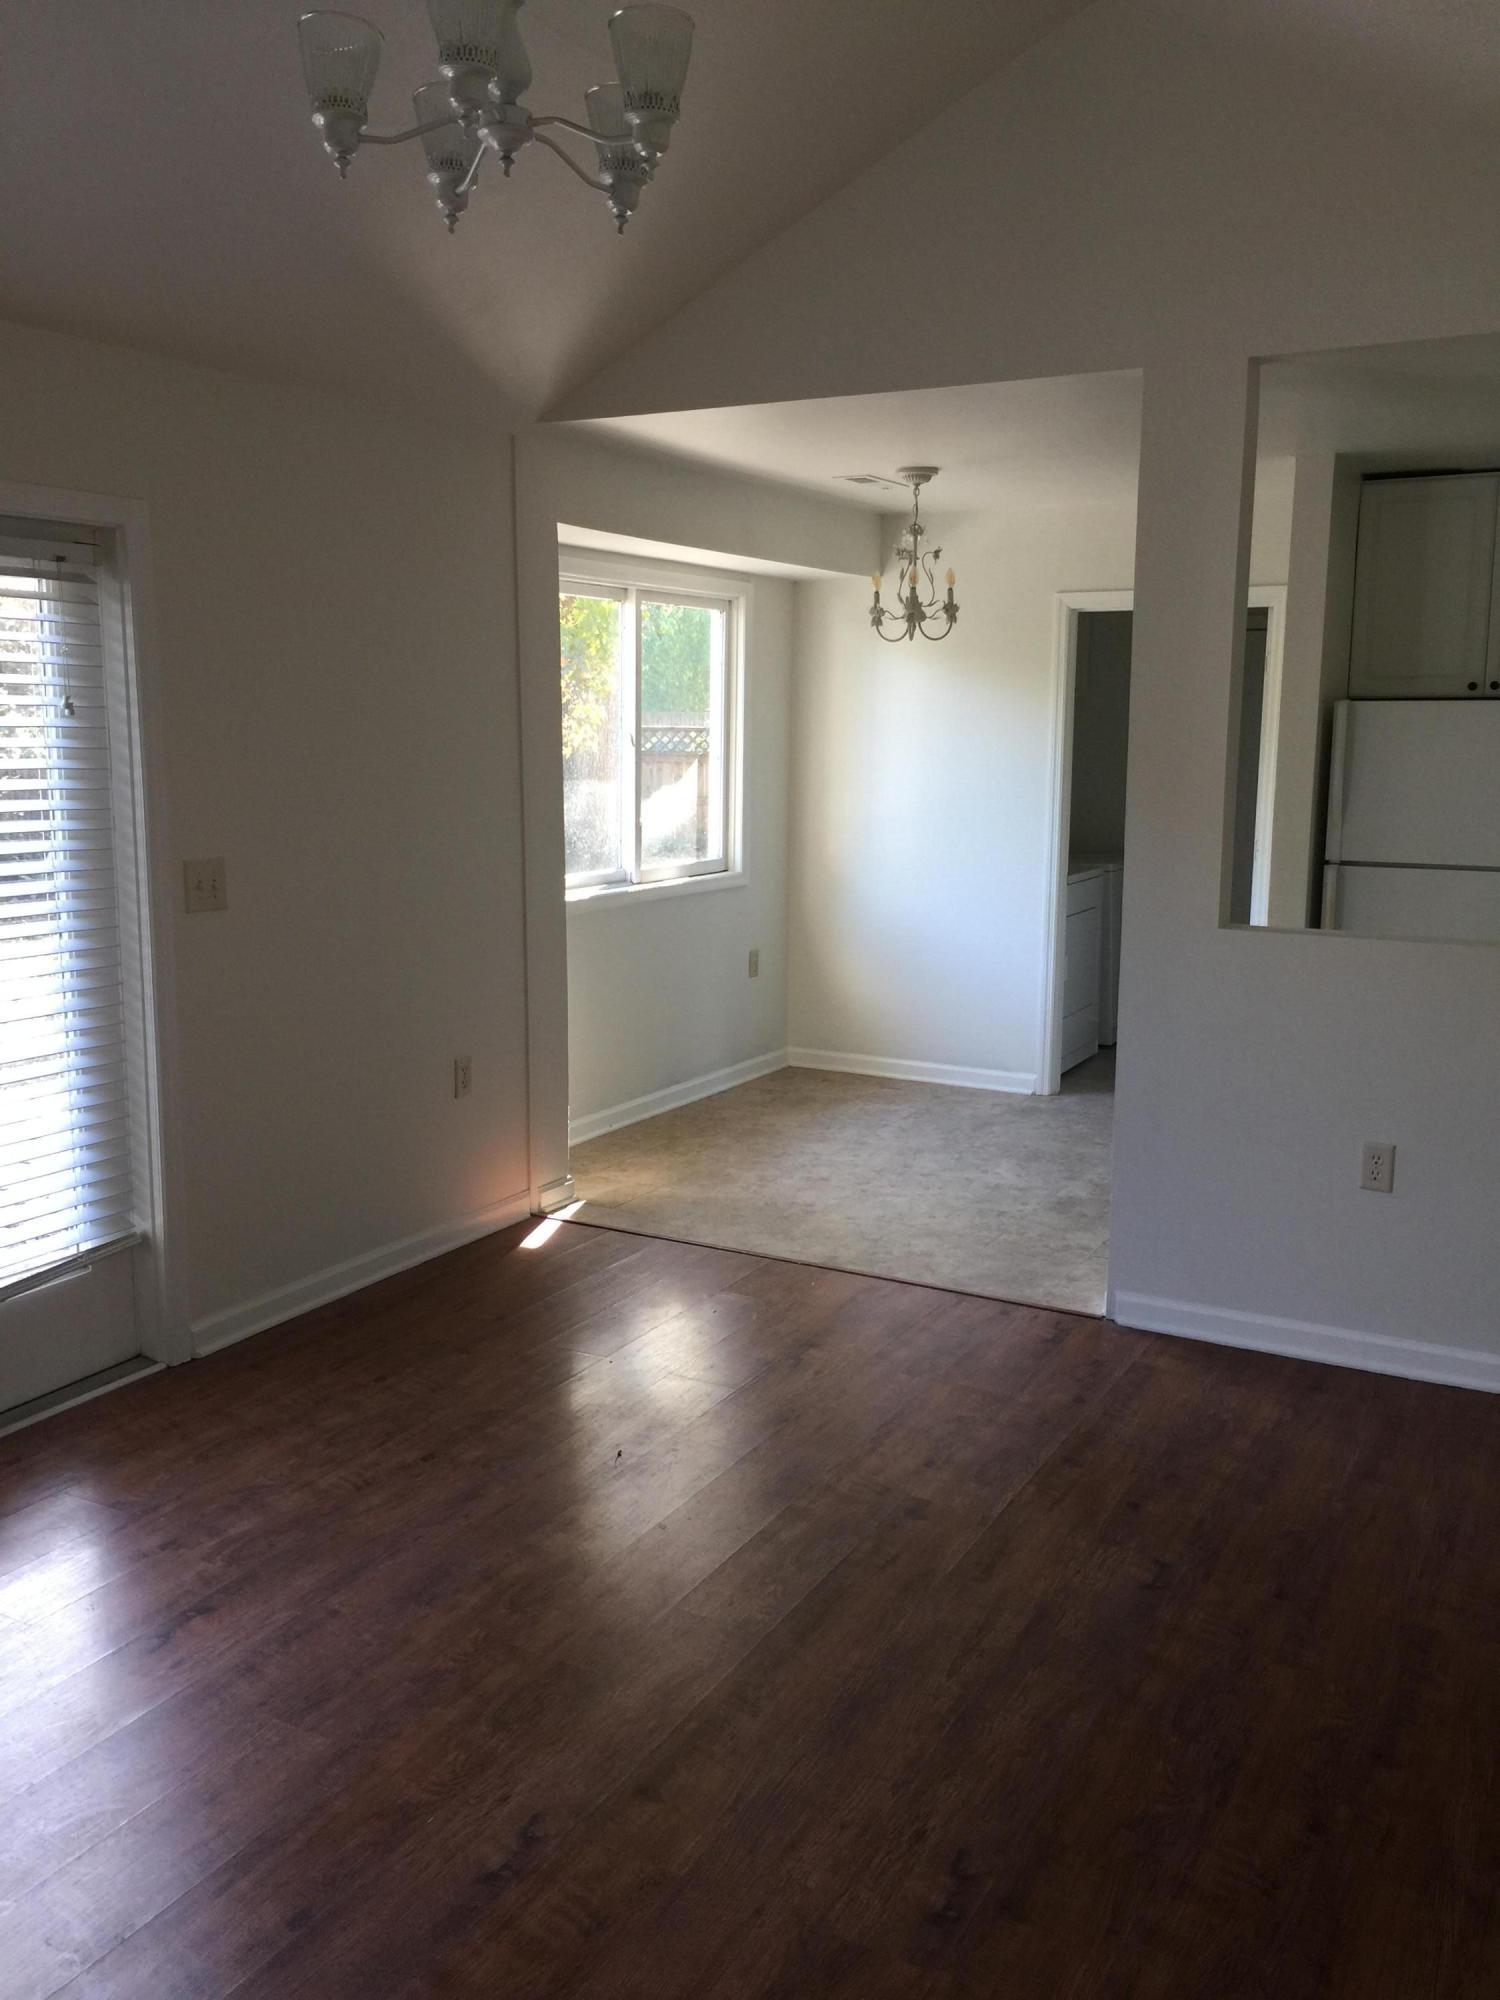 Quail Run Homes For Sale - 1202 Chicorie, Charleston, SC - 9